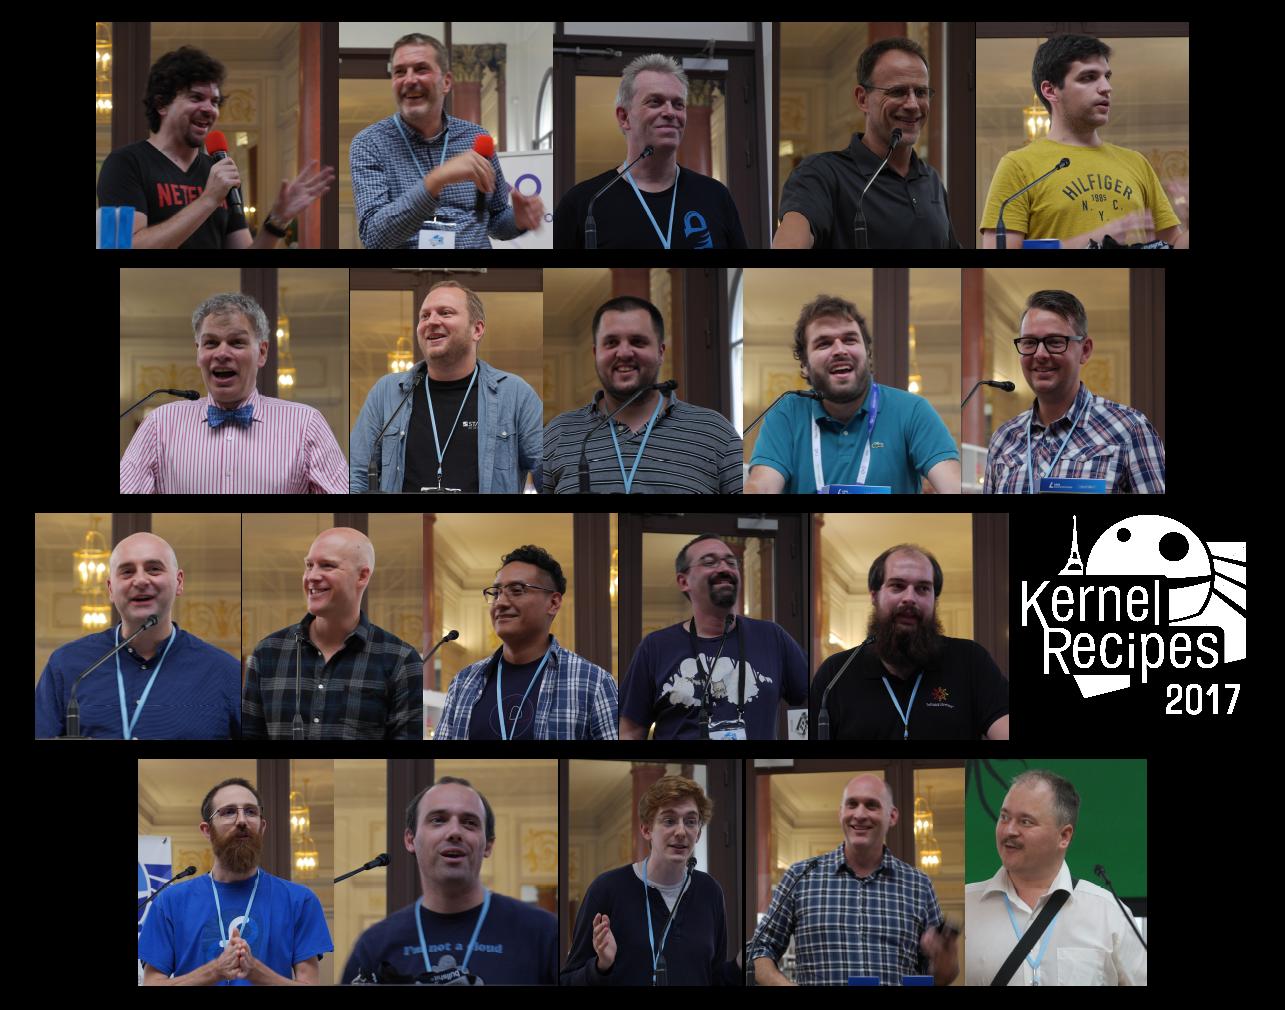 Kernel Recipes 2017 speakers